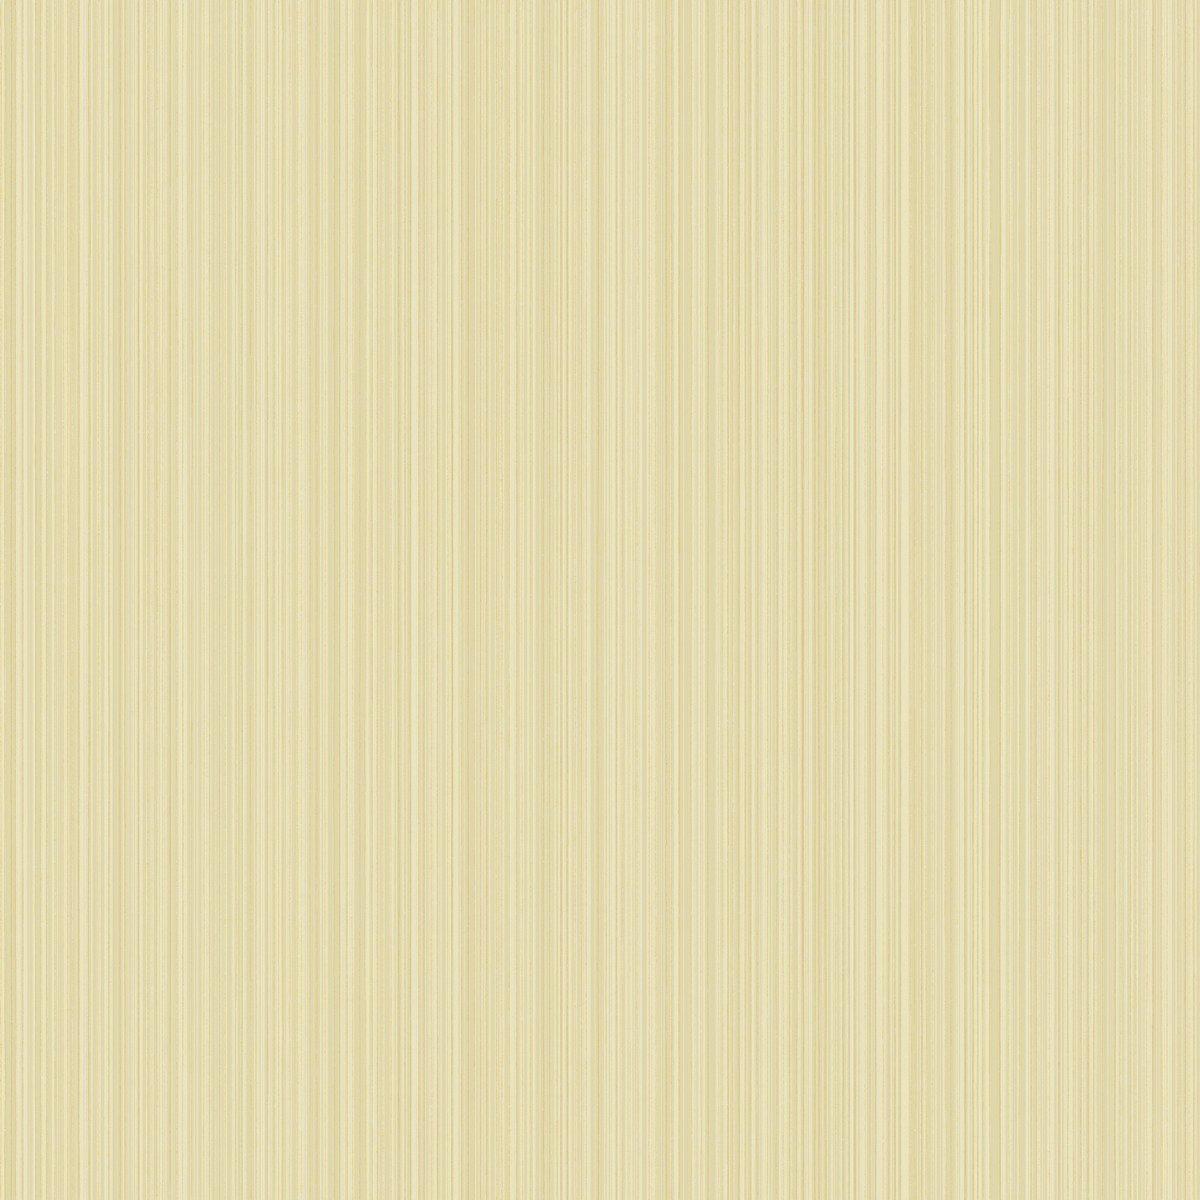 Обои Wallquest Trois TR61503, интернет магазин Волео